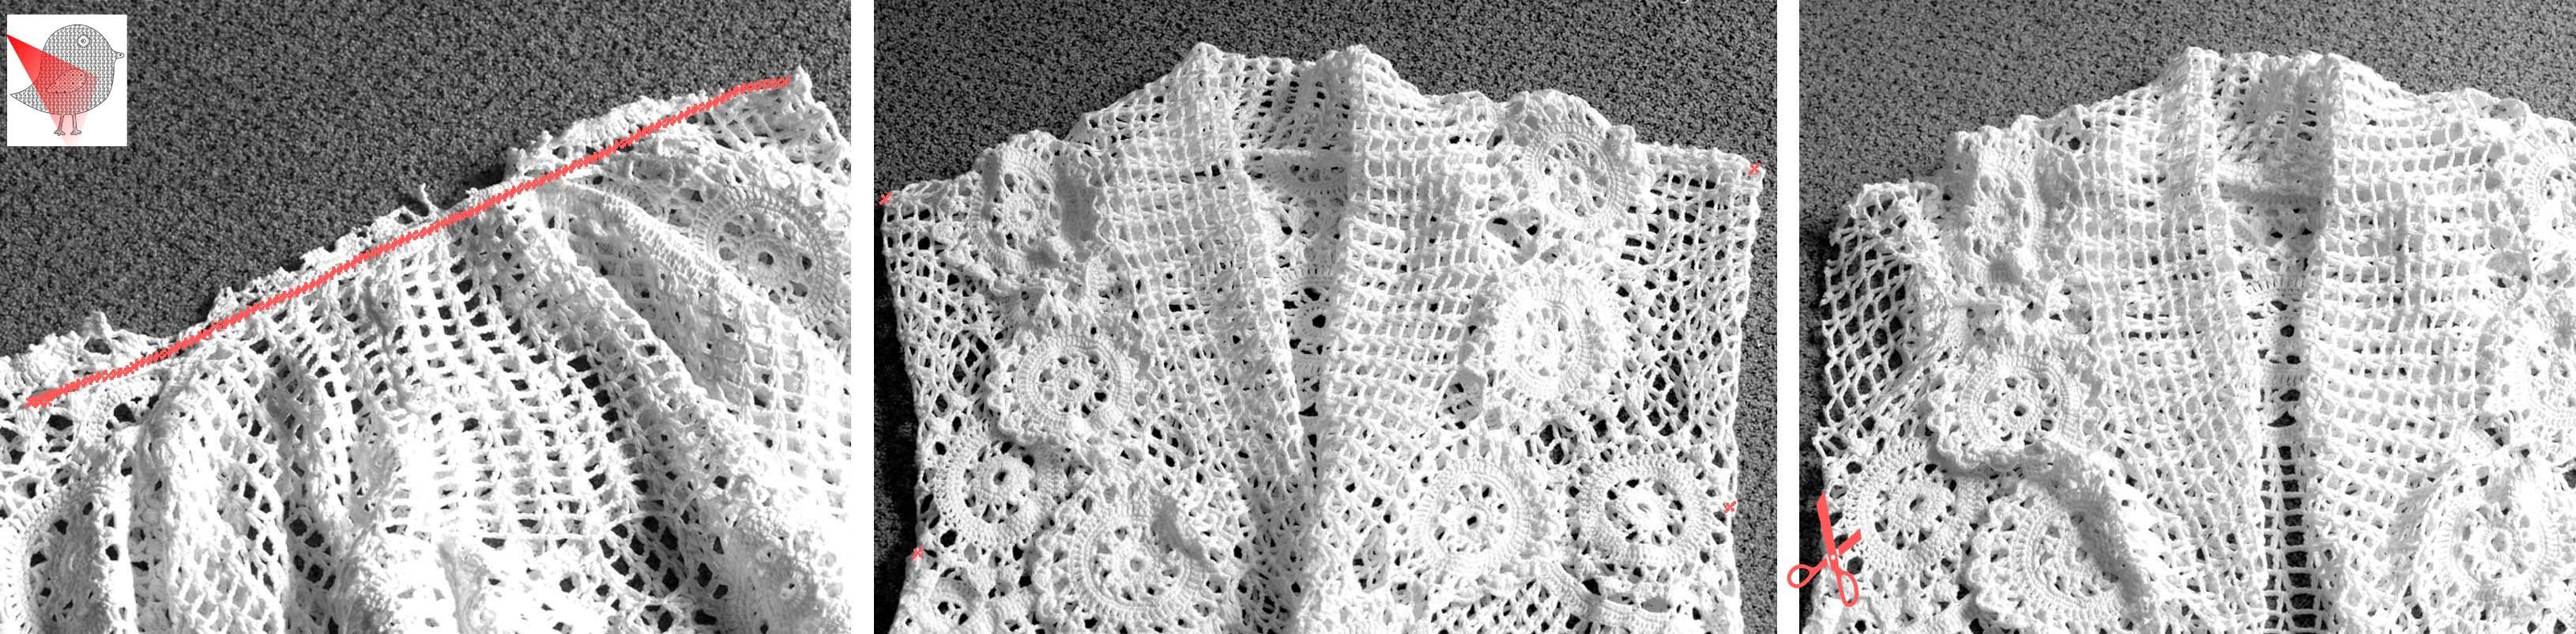 Crochet Tablecloth Waistcoat